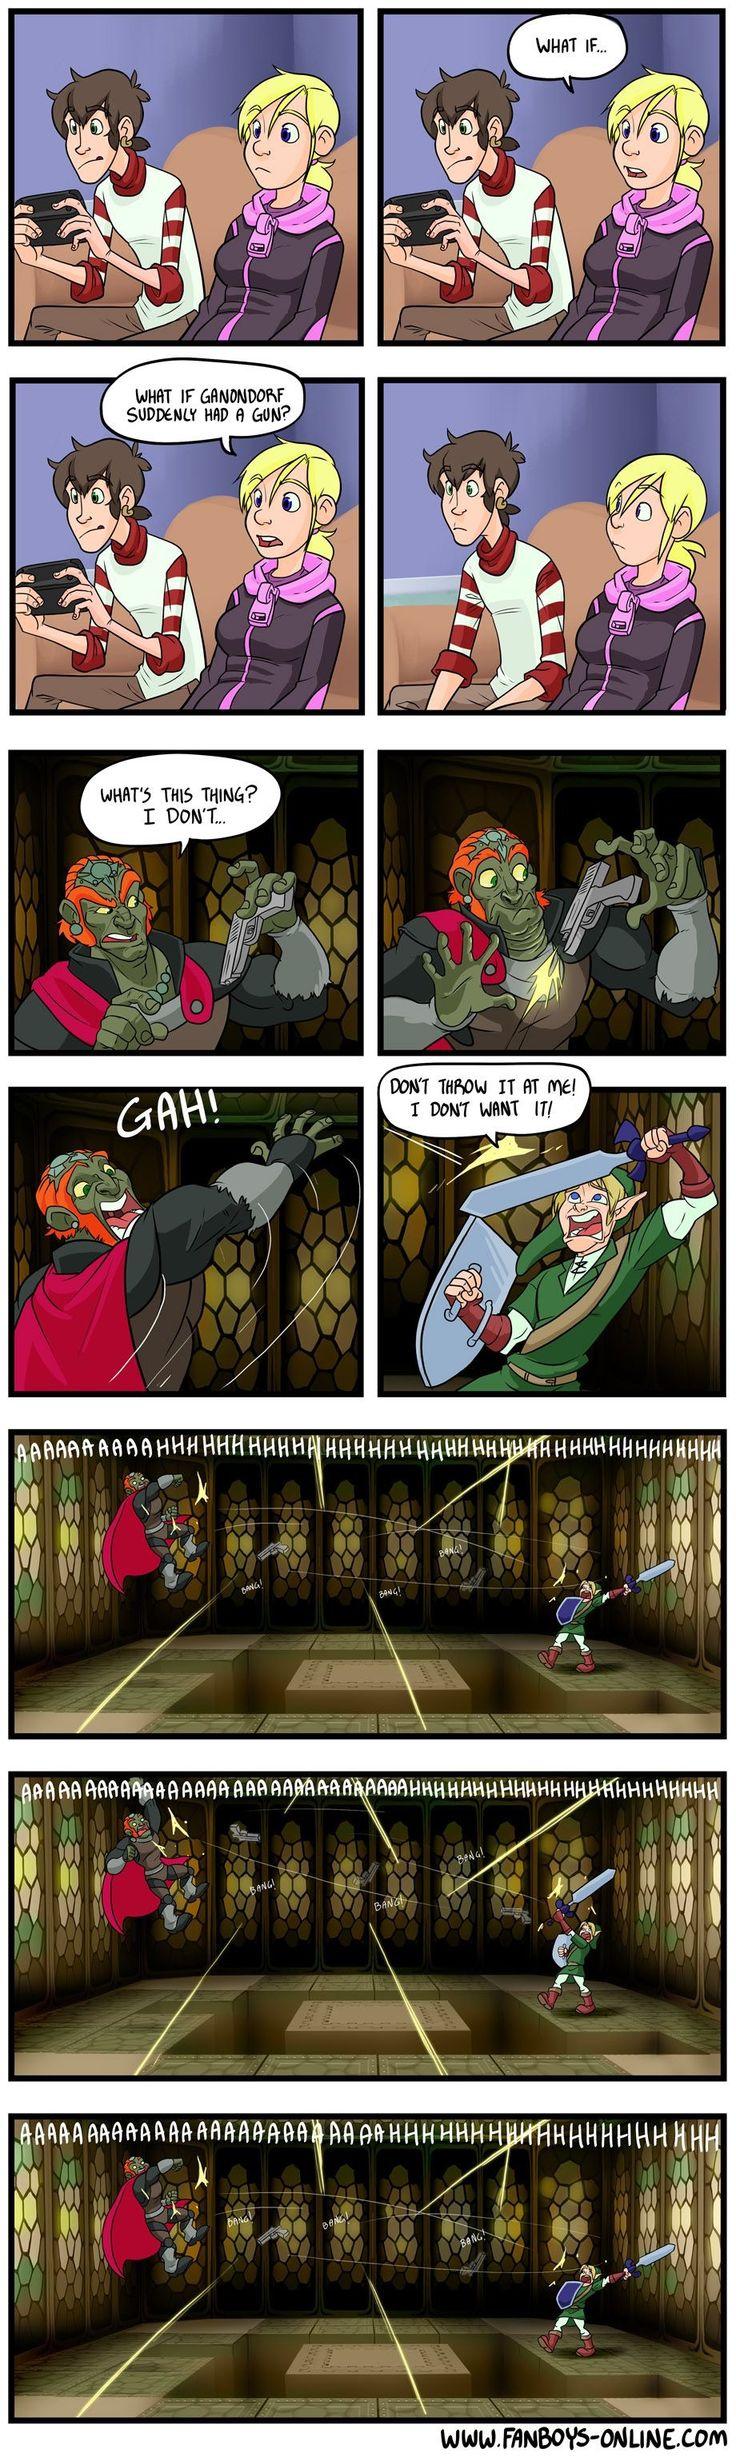 Zelda, Video Game Meme: If Zelda games turned FPS #gamermeme #gaming #gamerproblems